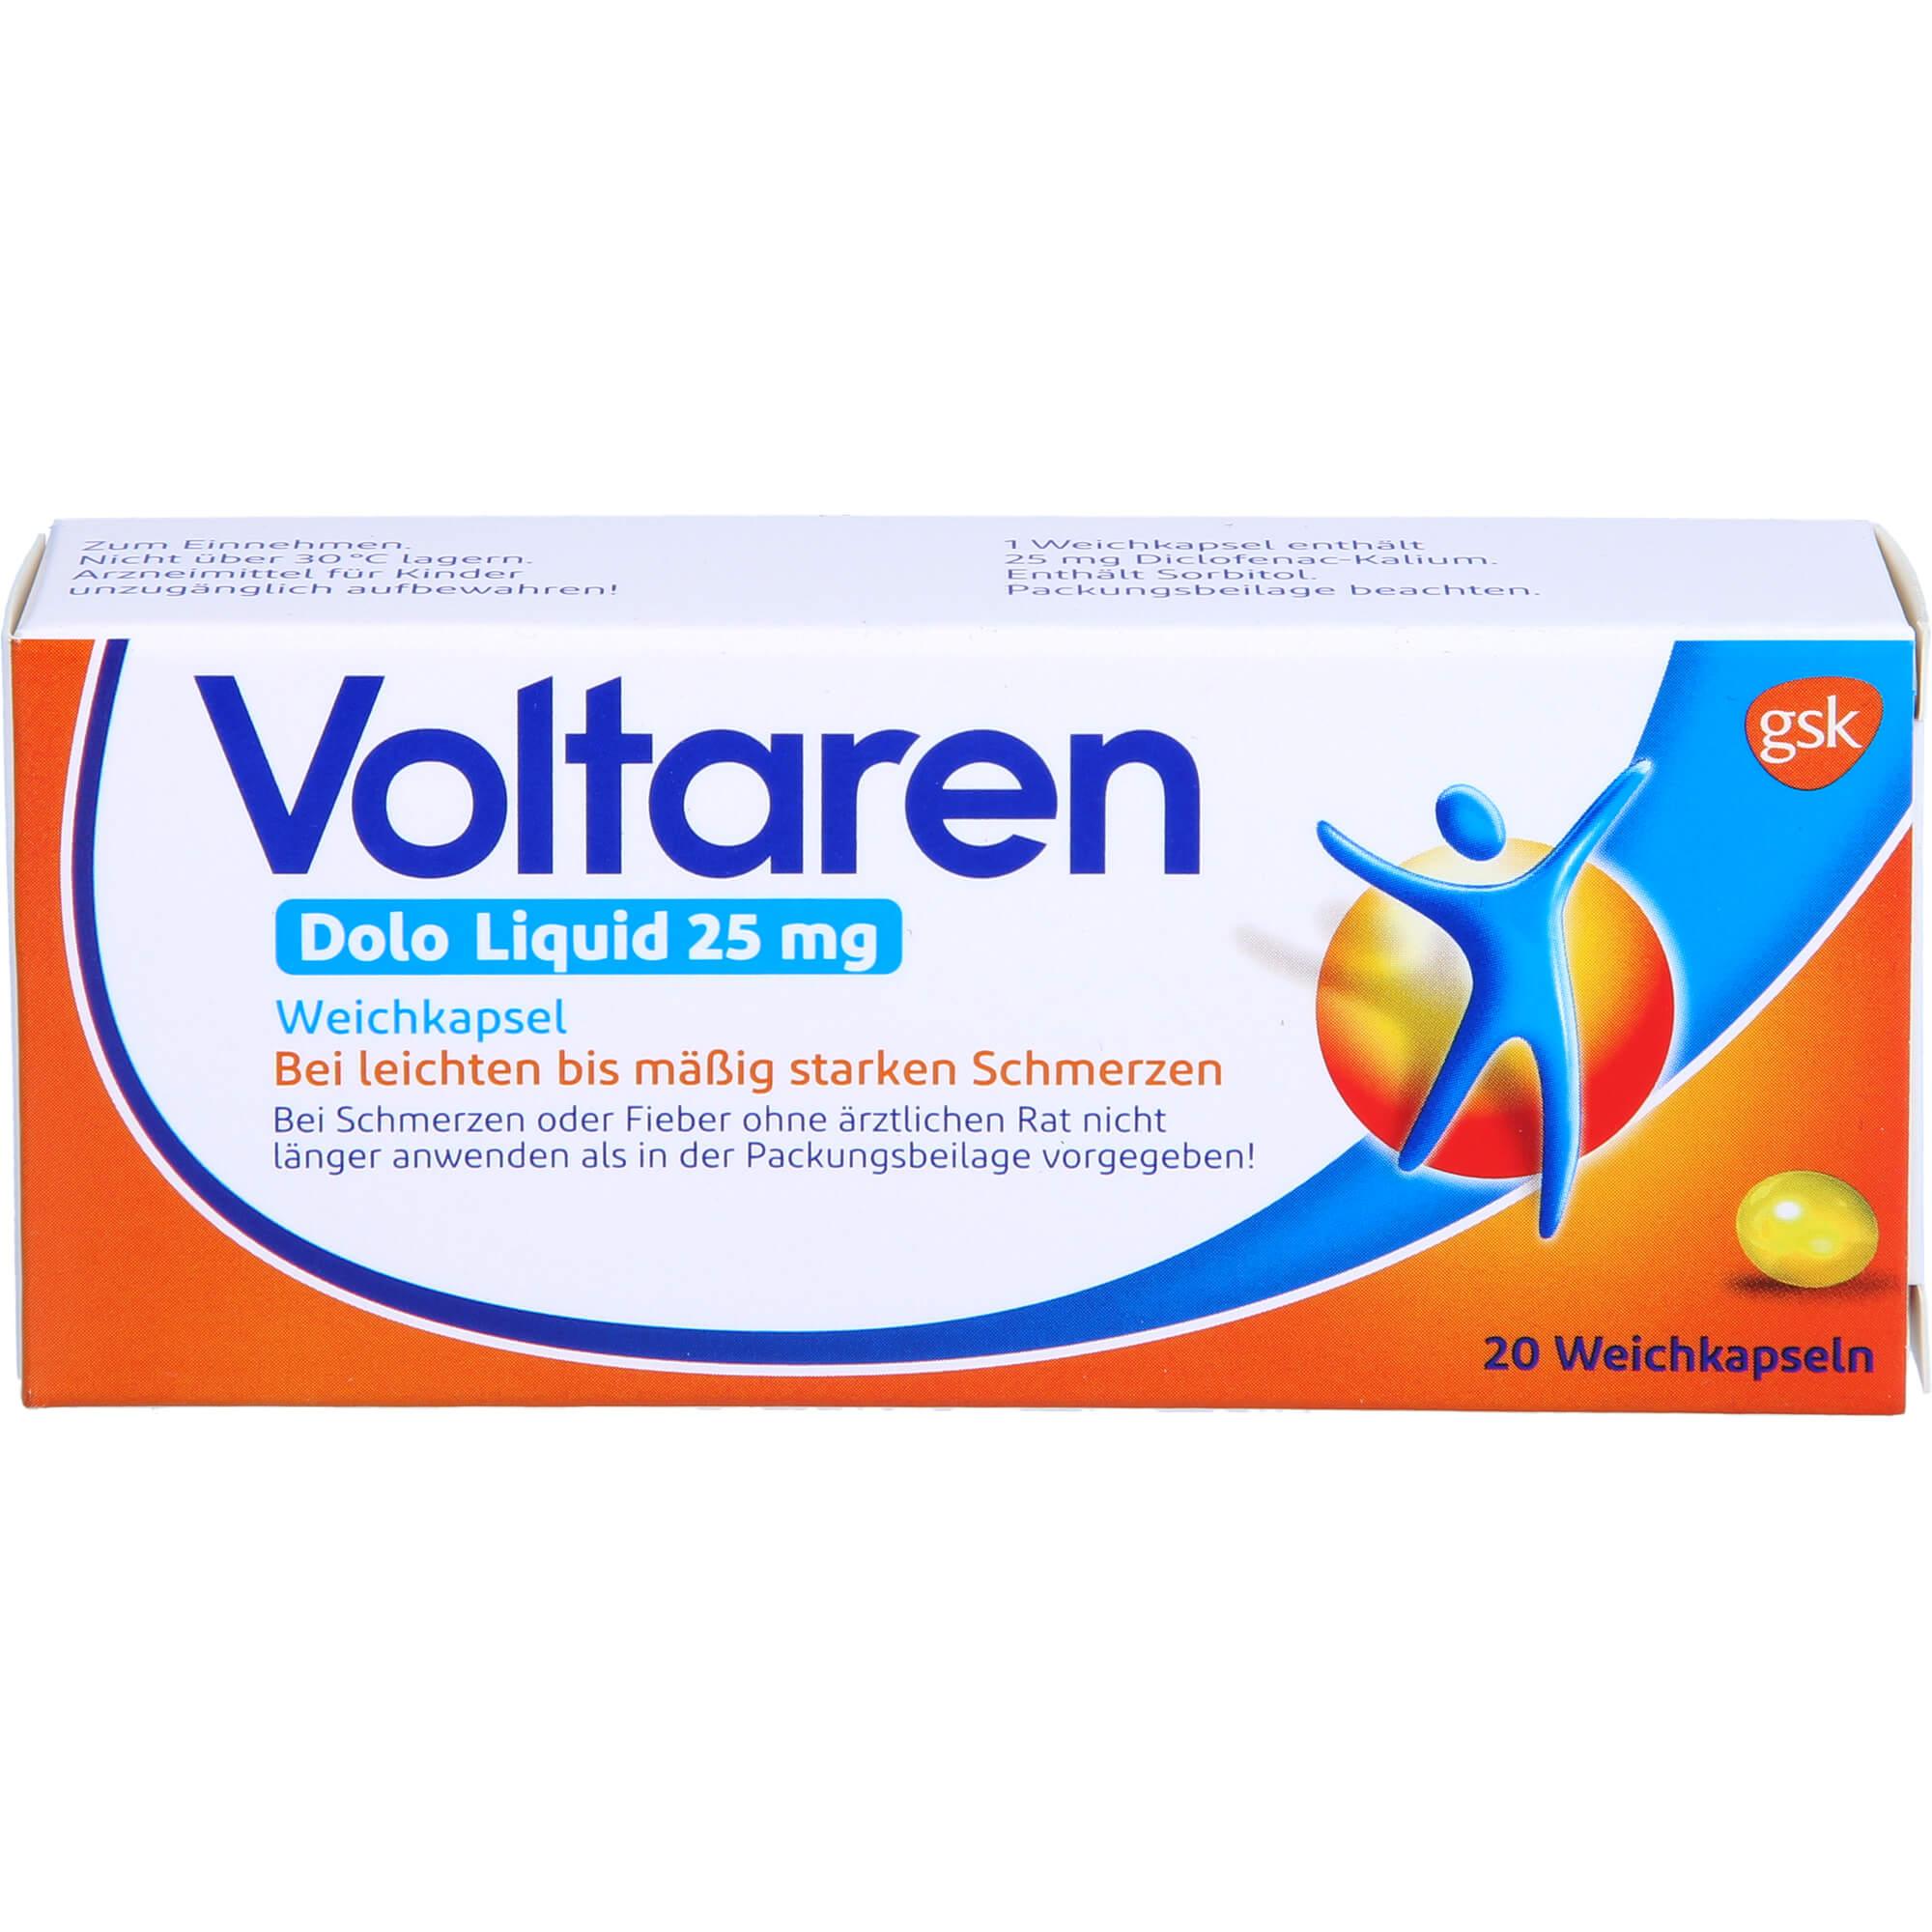 VOLTAREN-Dolo-Liquid-25-mg-Weichkapseln